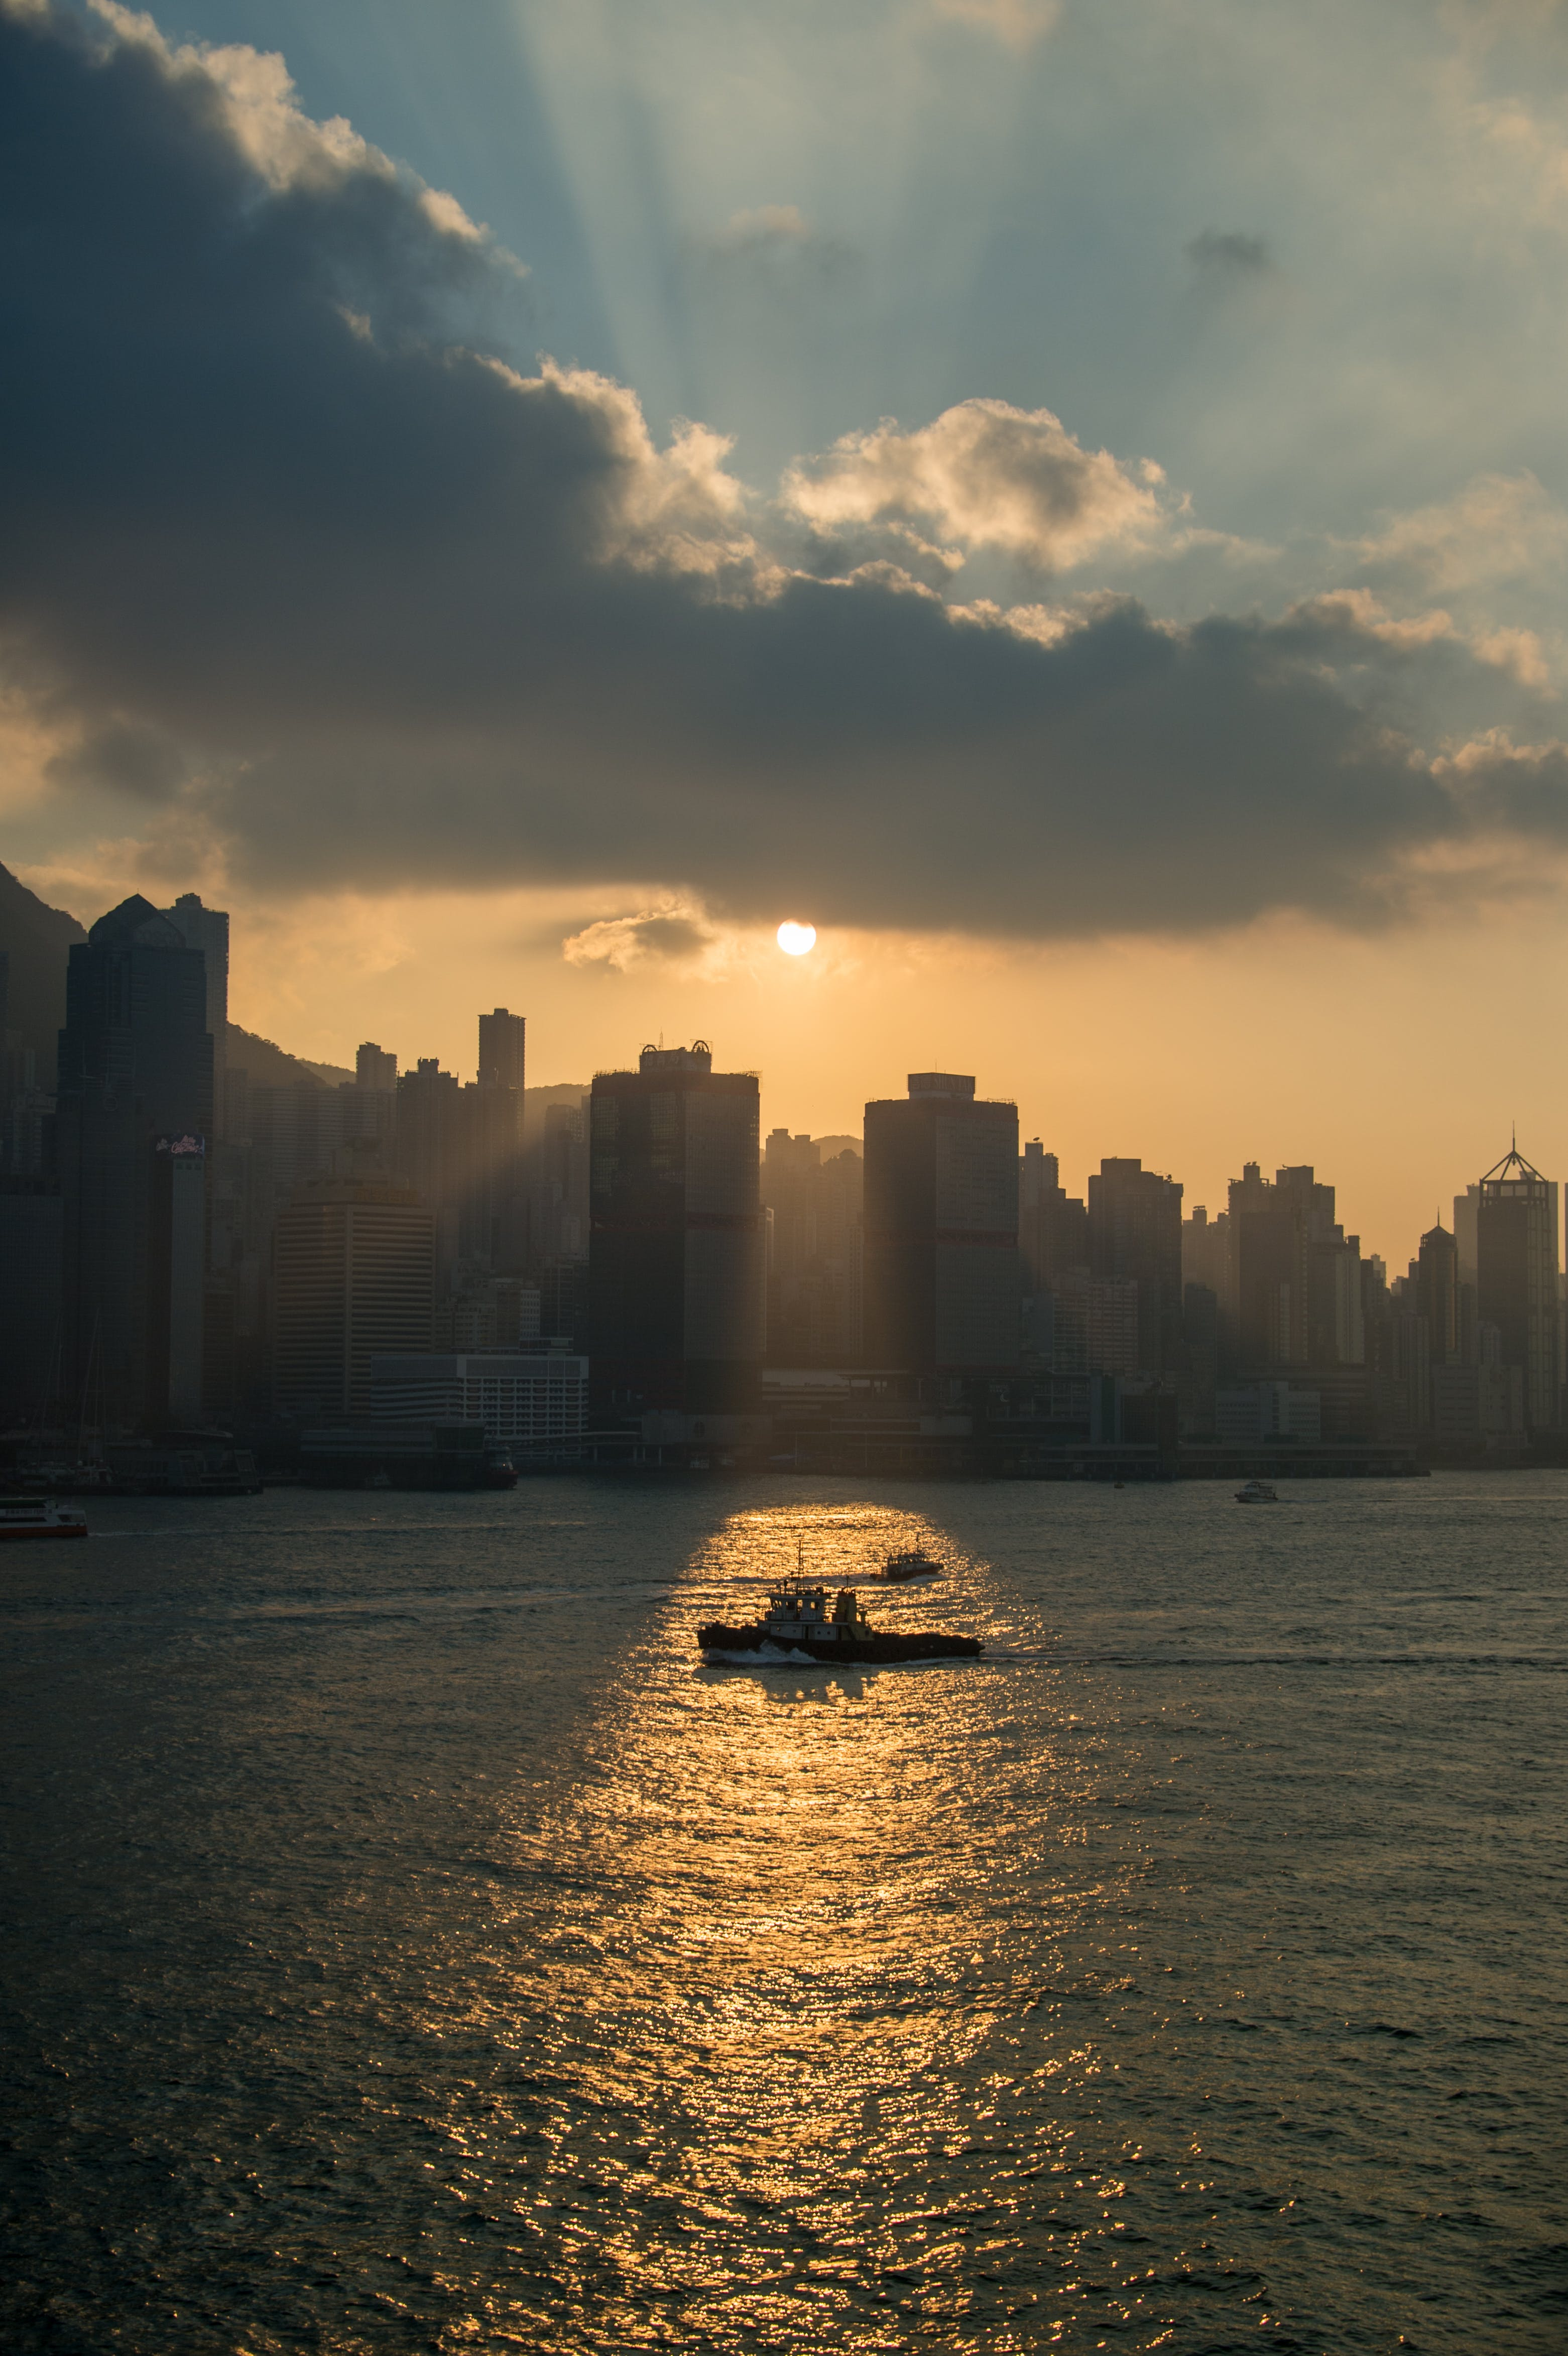 Free stock photo of city, sunset, clouds, sun